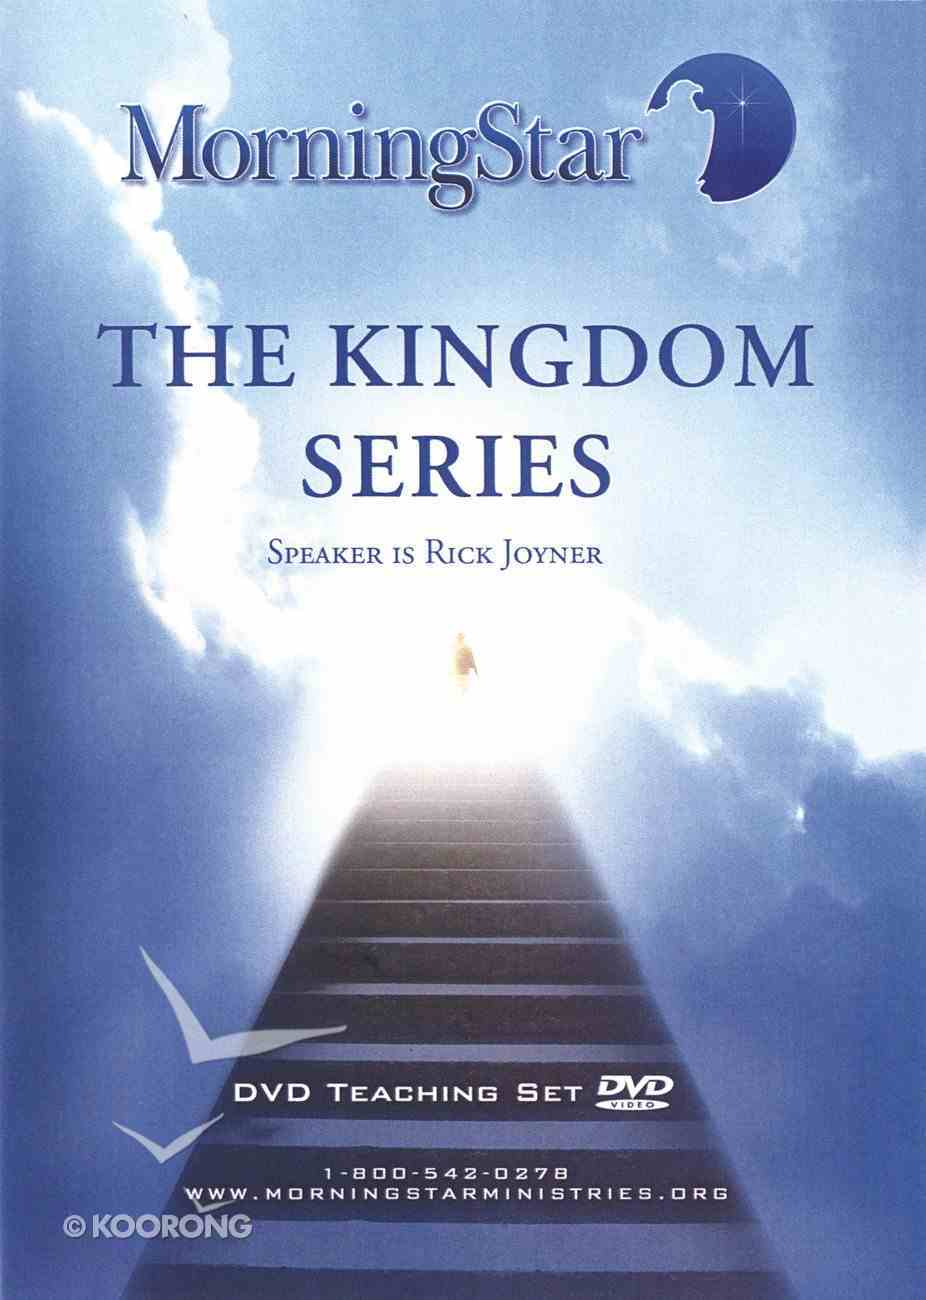 The Kingdom Series DVD